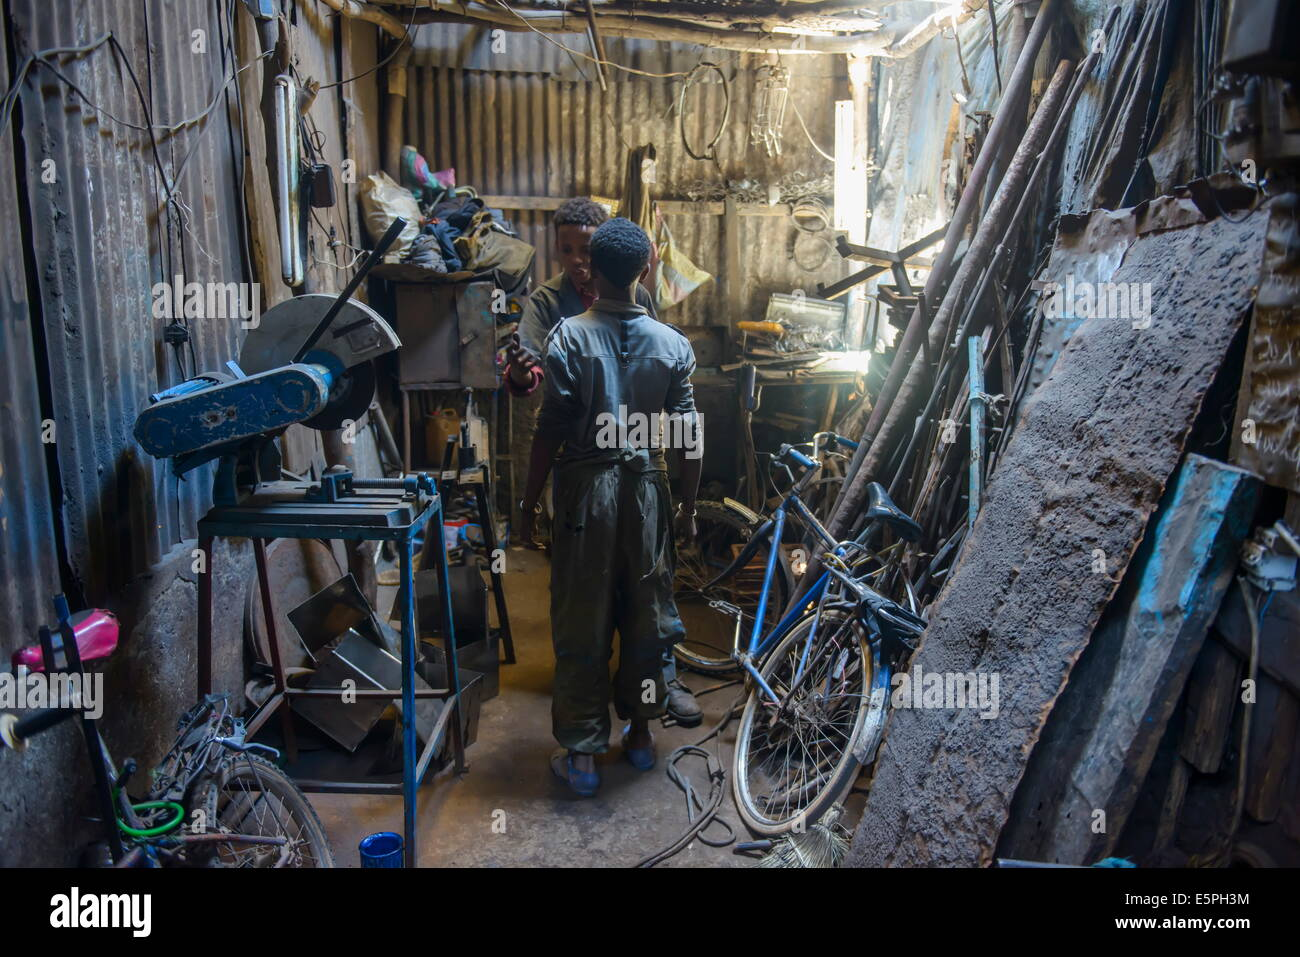 Metall-Smith, Medebar Markt, Asmara, Hauptstadt von Eritrea, Afrika Stockbild